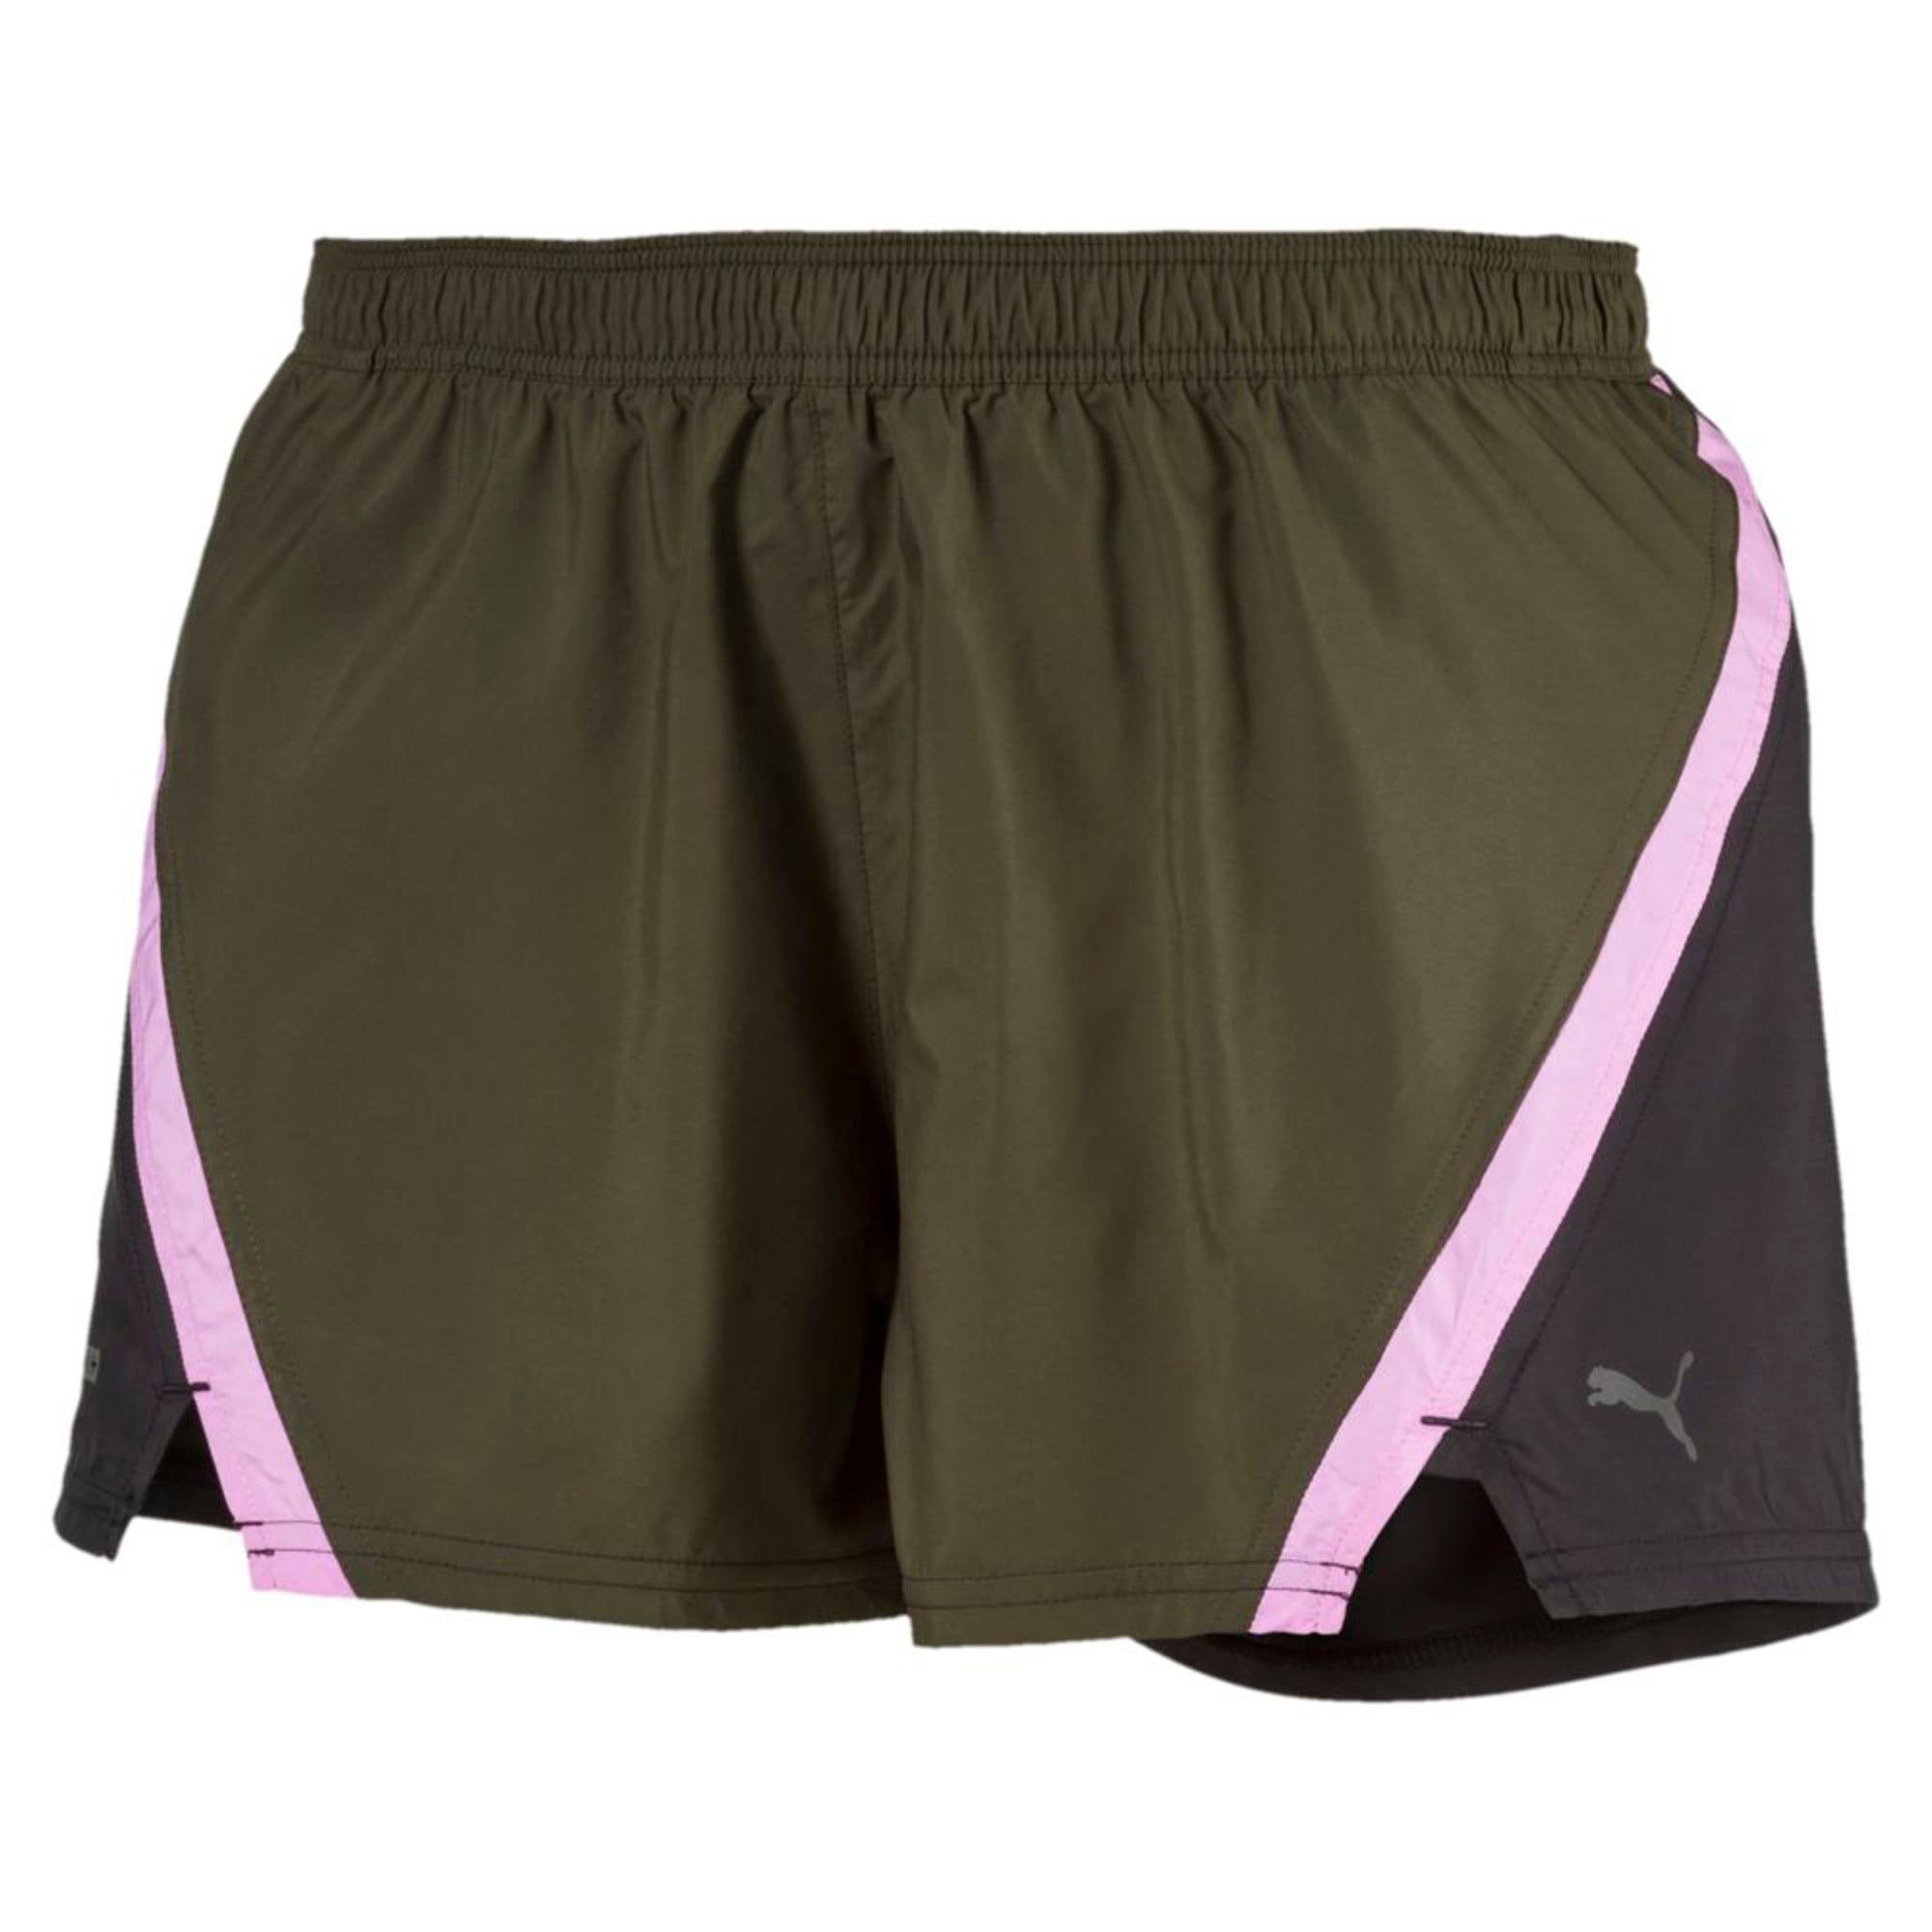 Thumbnail 4 of Blast 3'' Women's Training Shorts, Forest Night, medium-IND